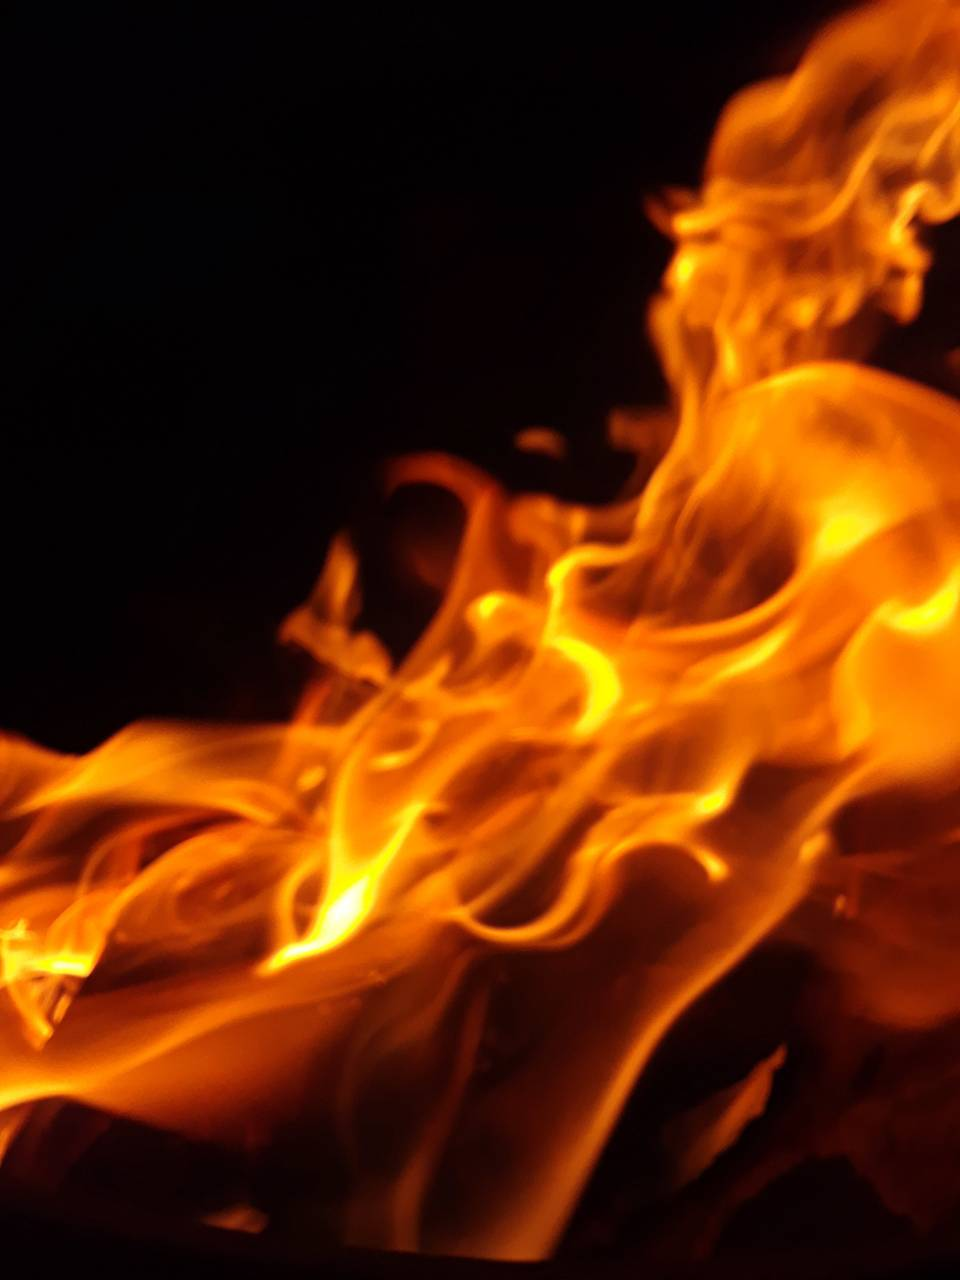 Flame stream